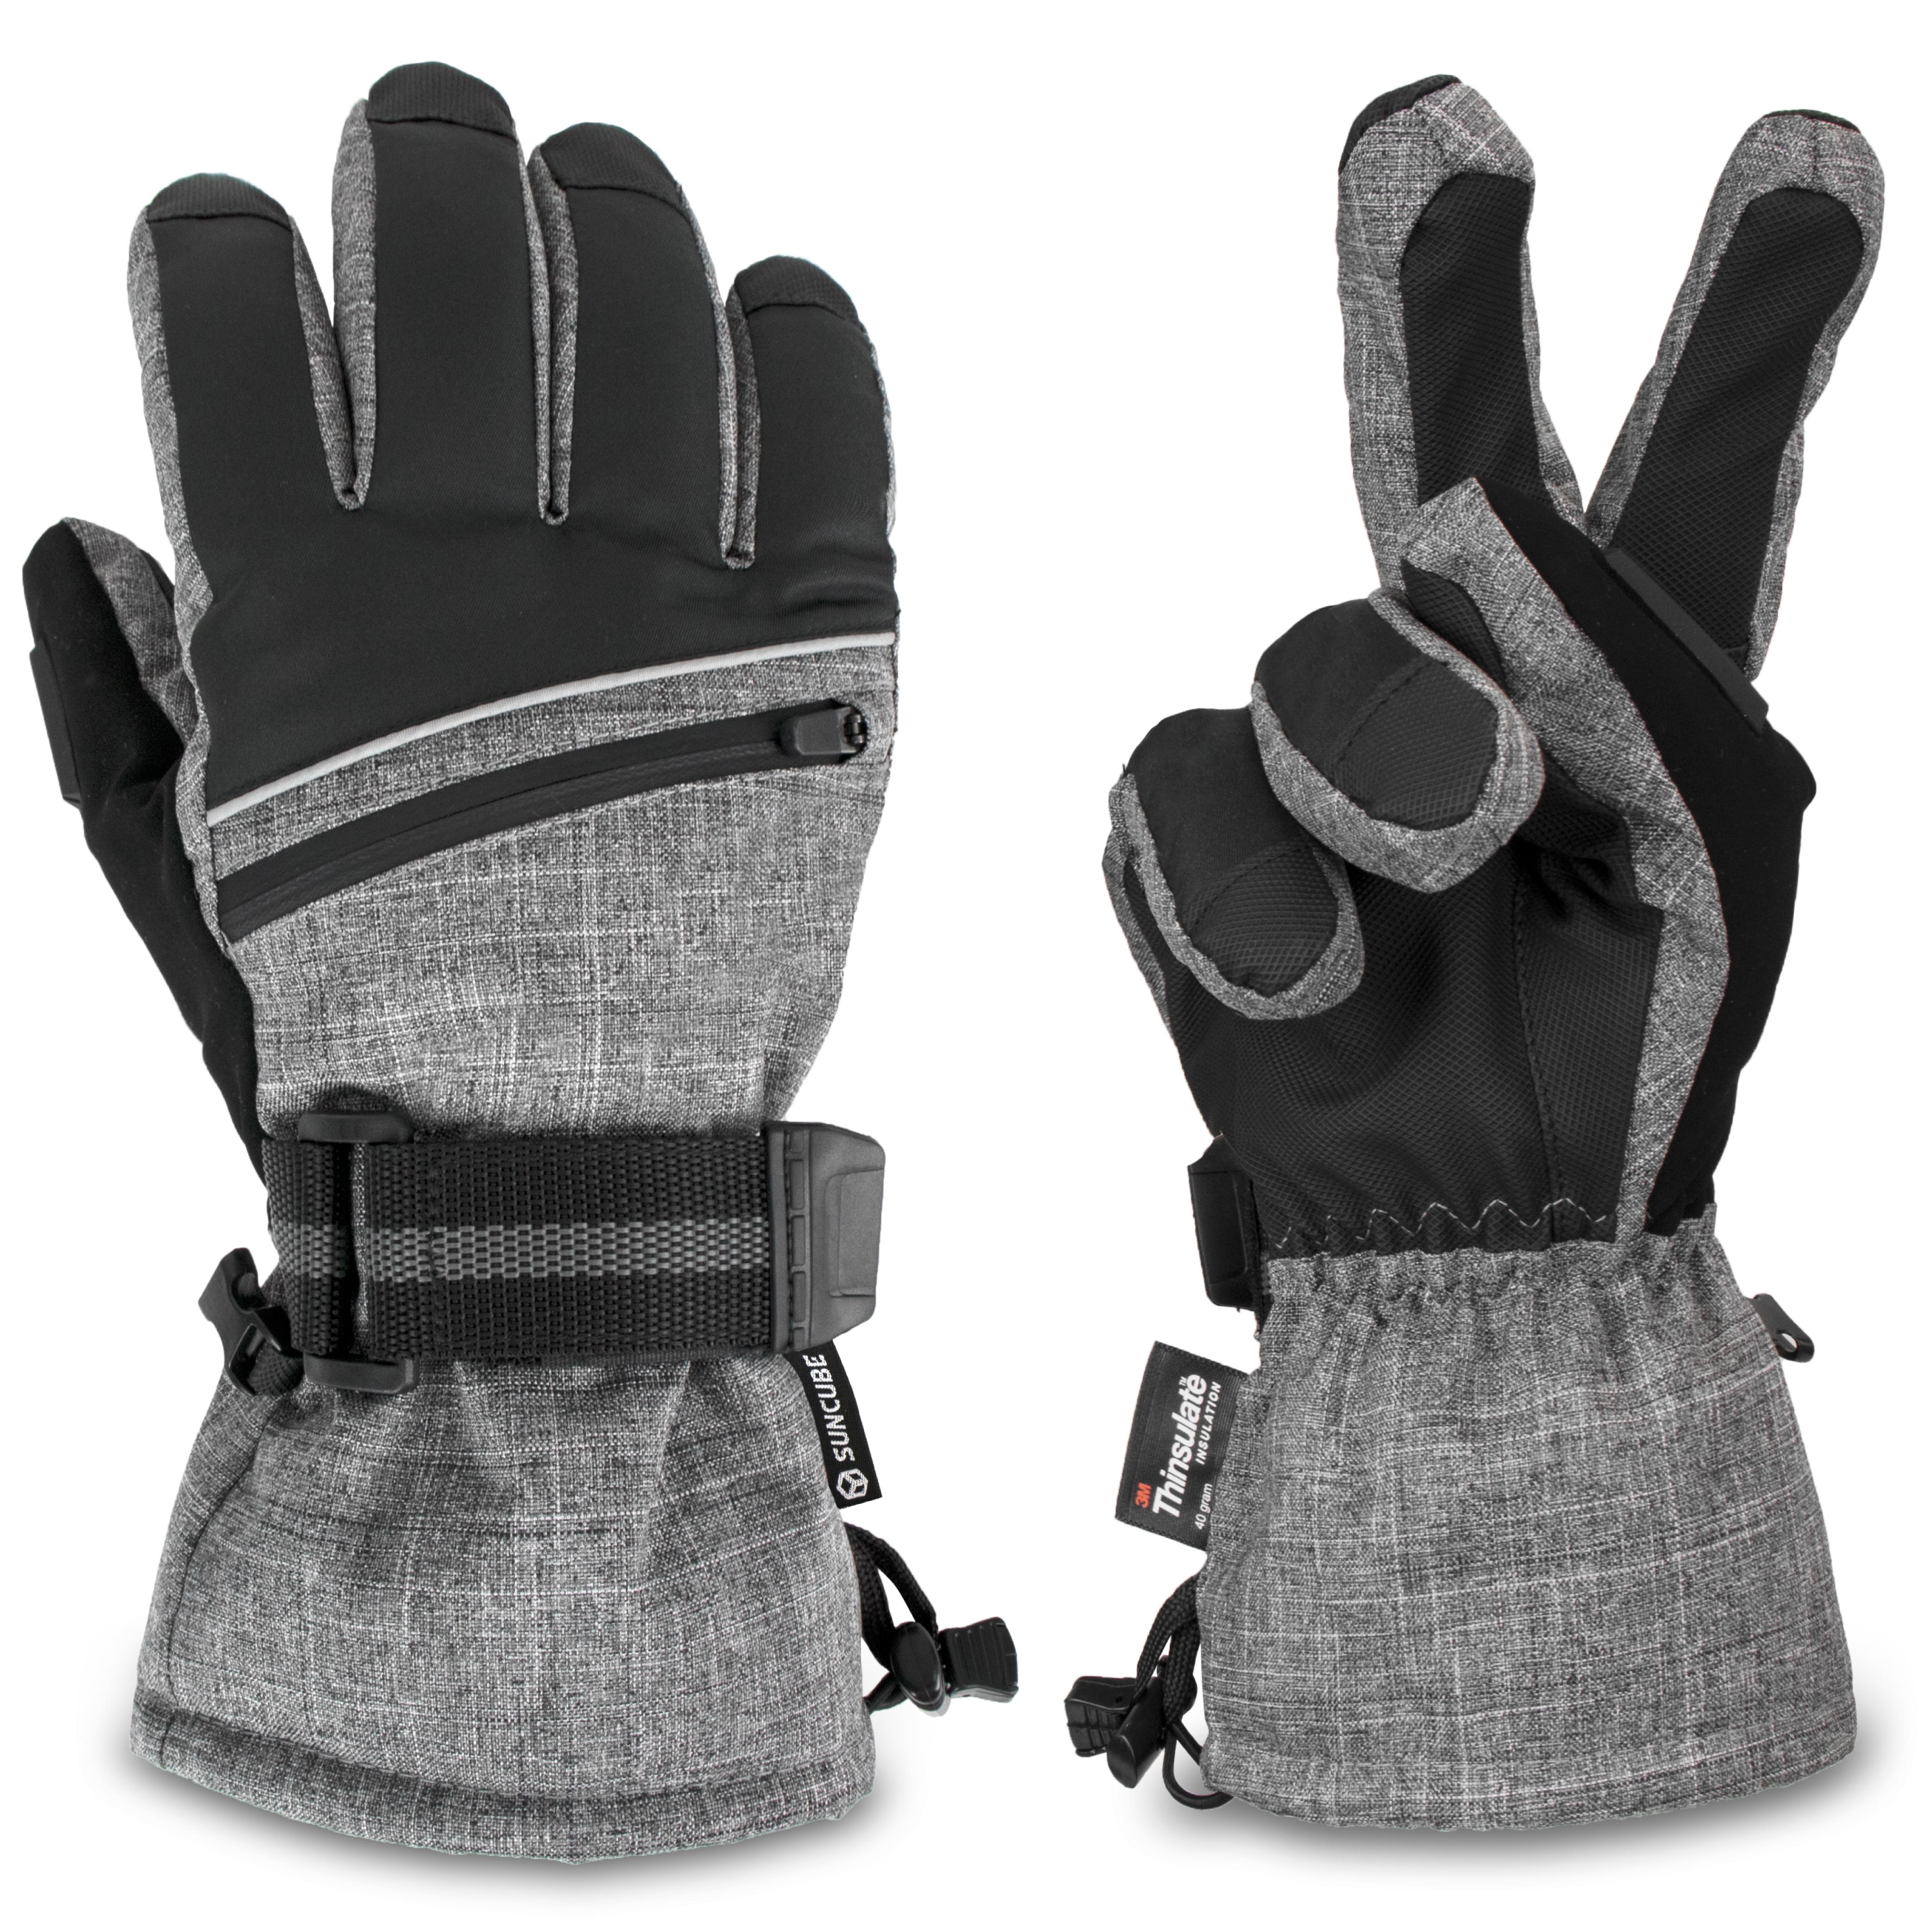 40℃ Waterproof Keep Warm Thermal Ski Skiing Snow Snowboarding Gloves Thinsulate